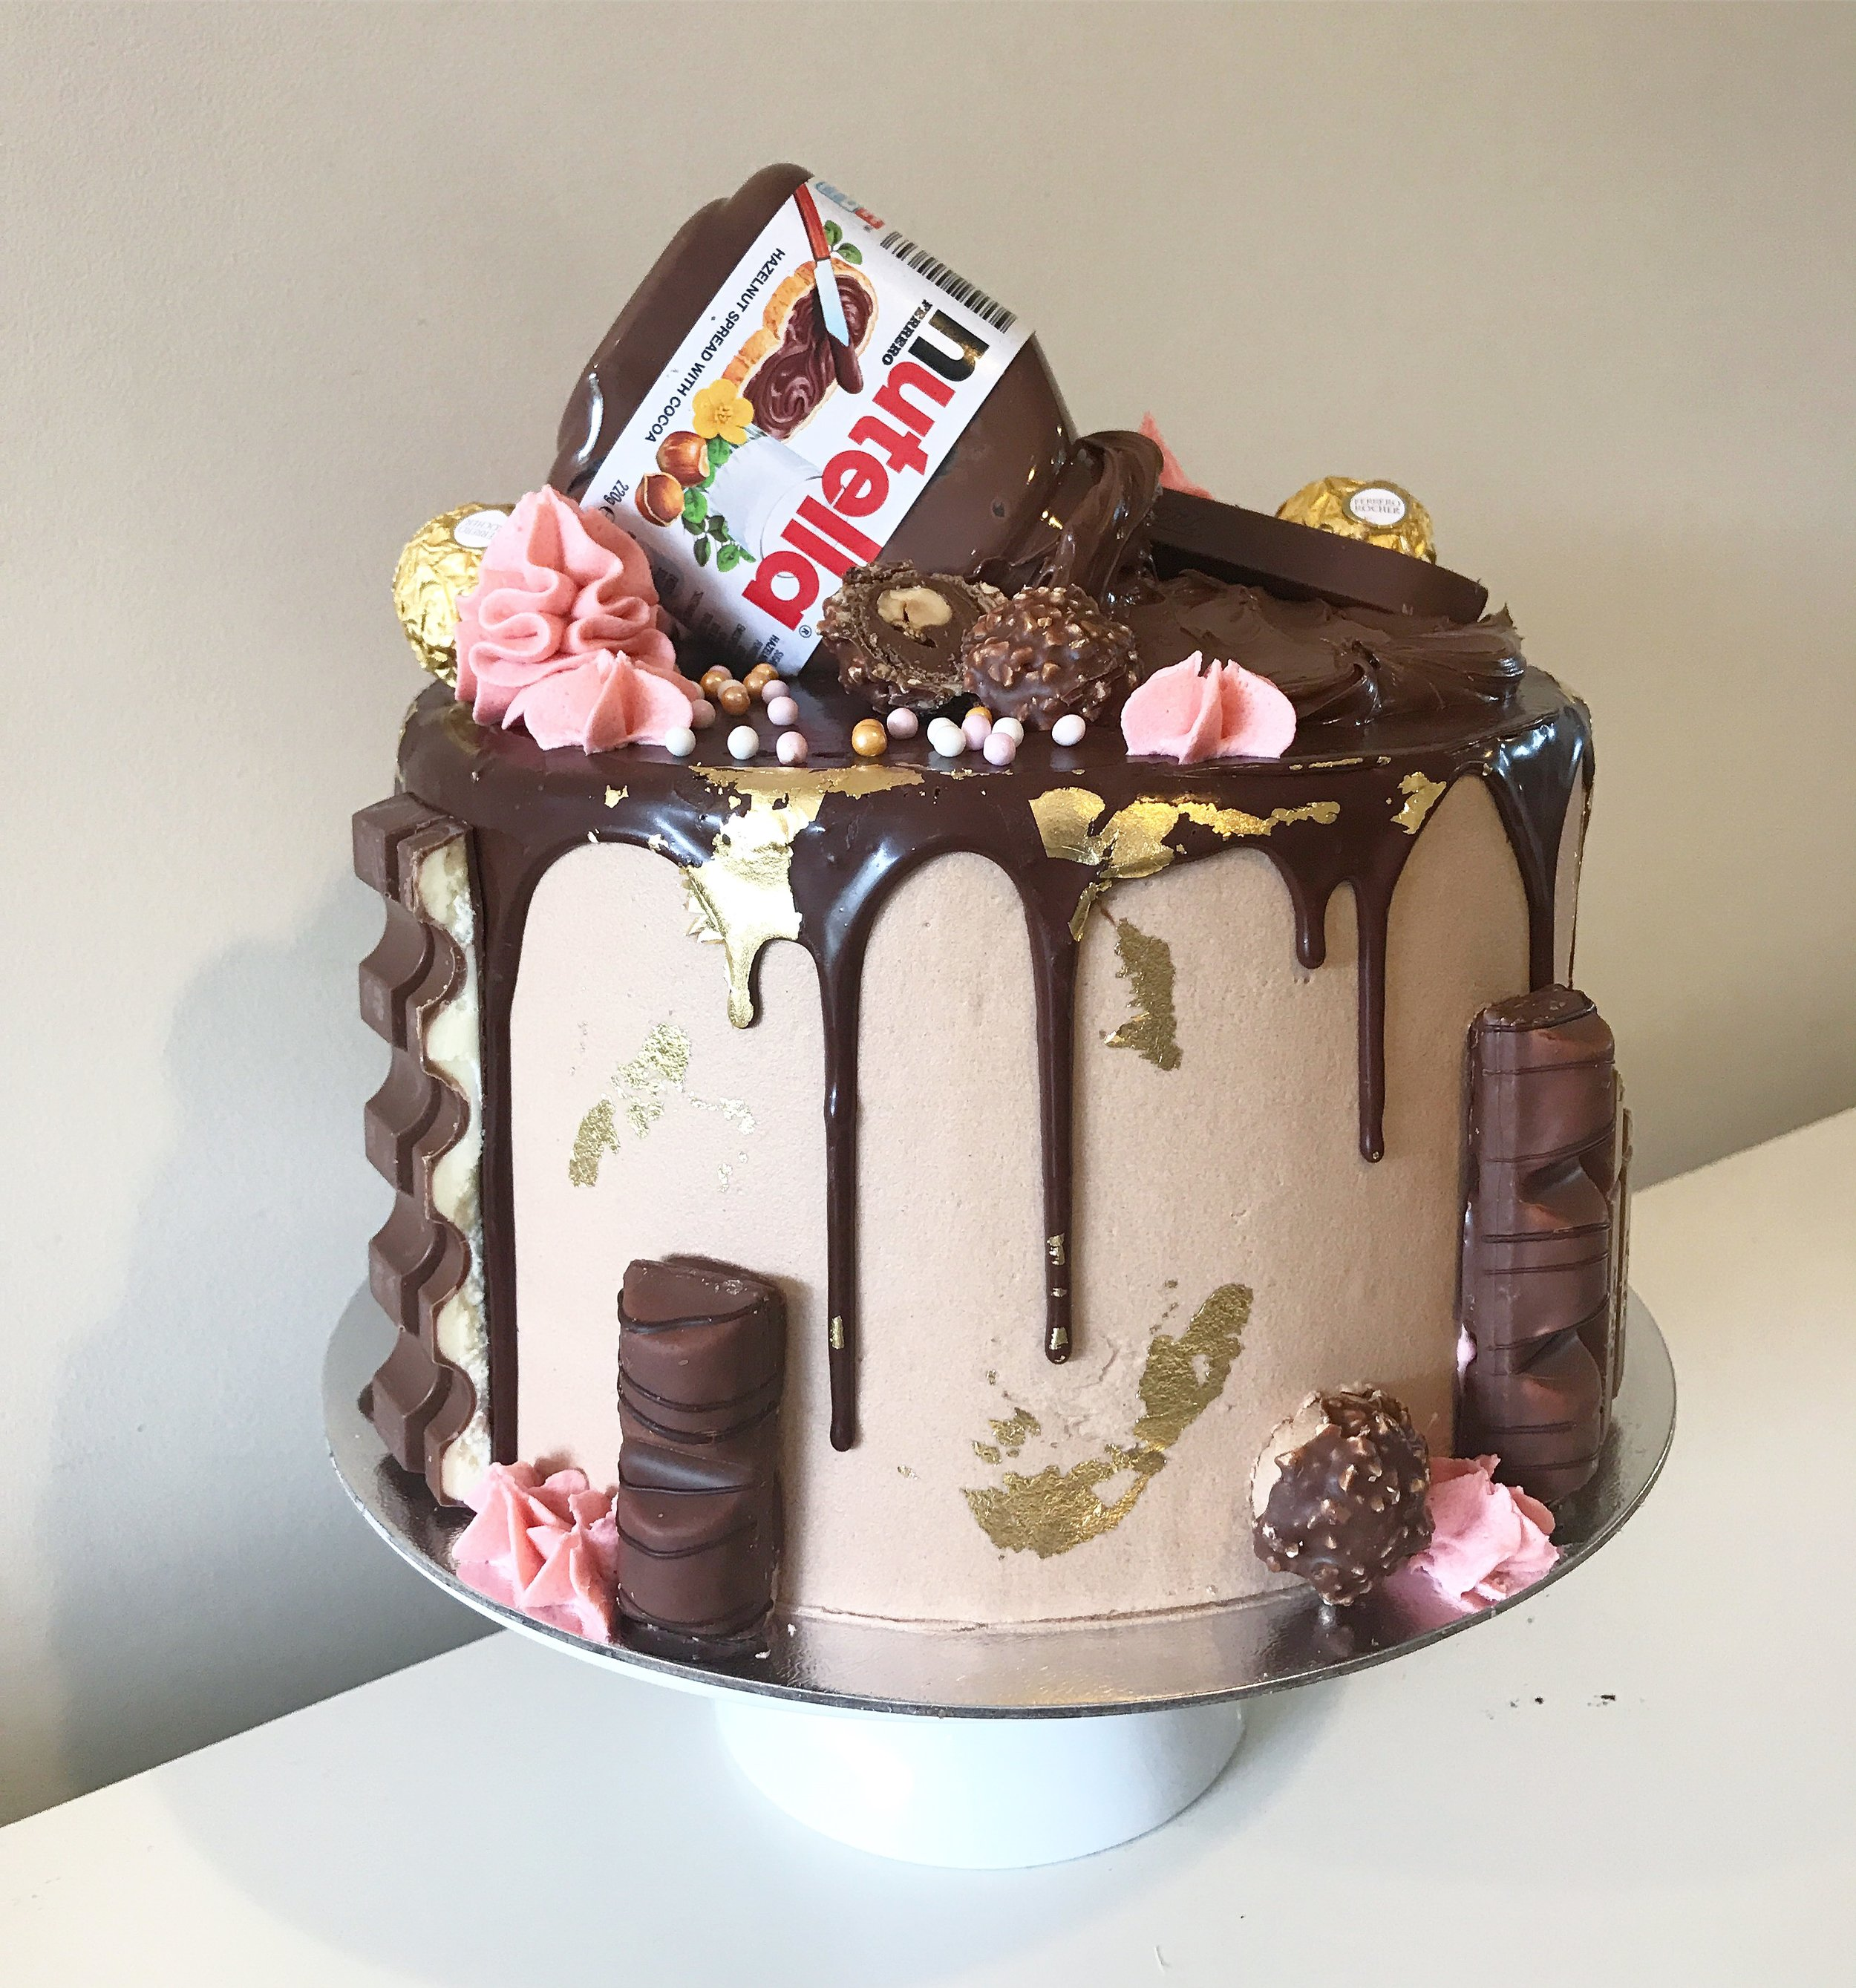 Our Little Kitchen — Nutella